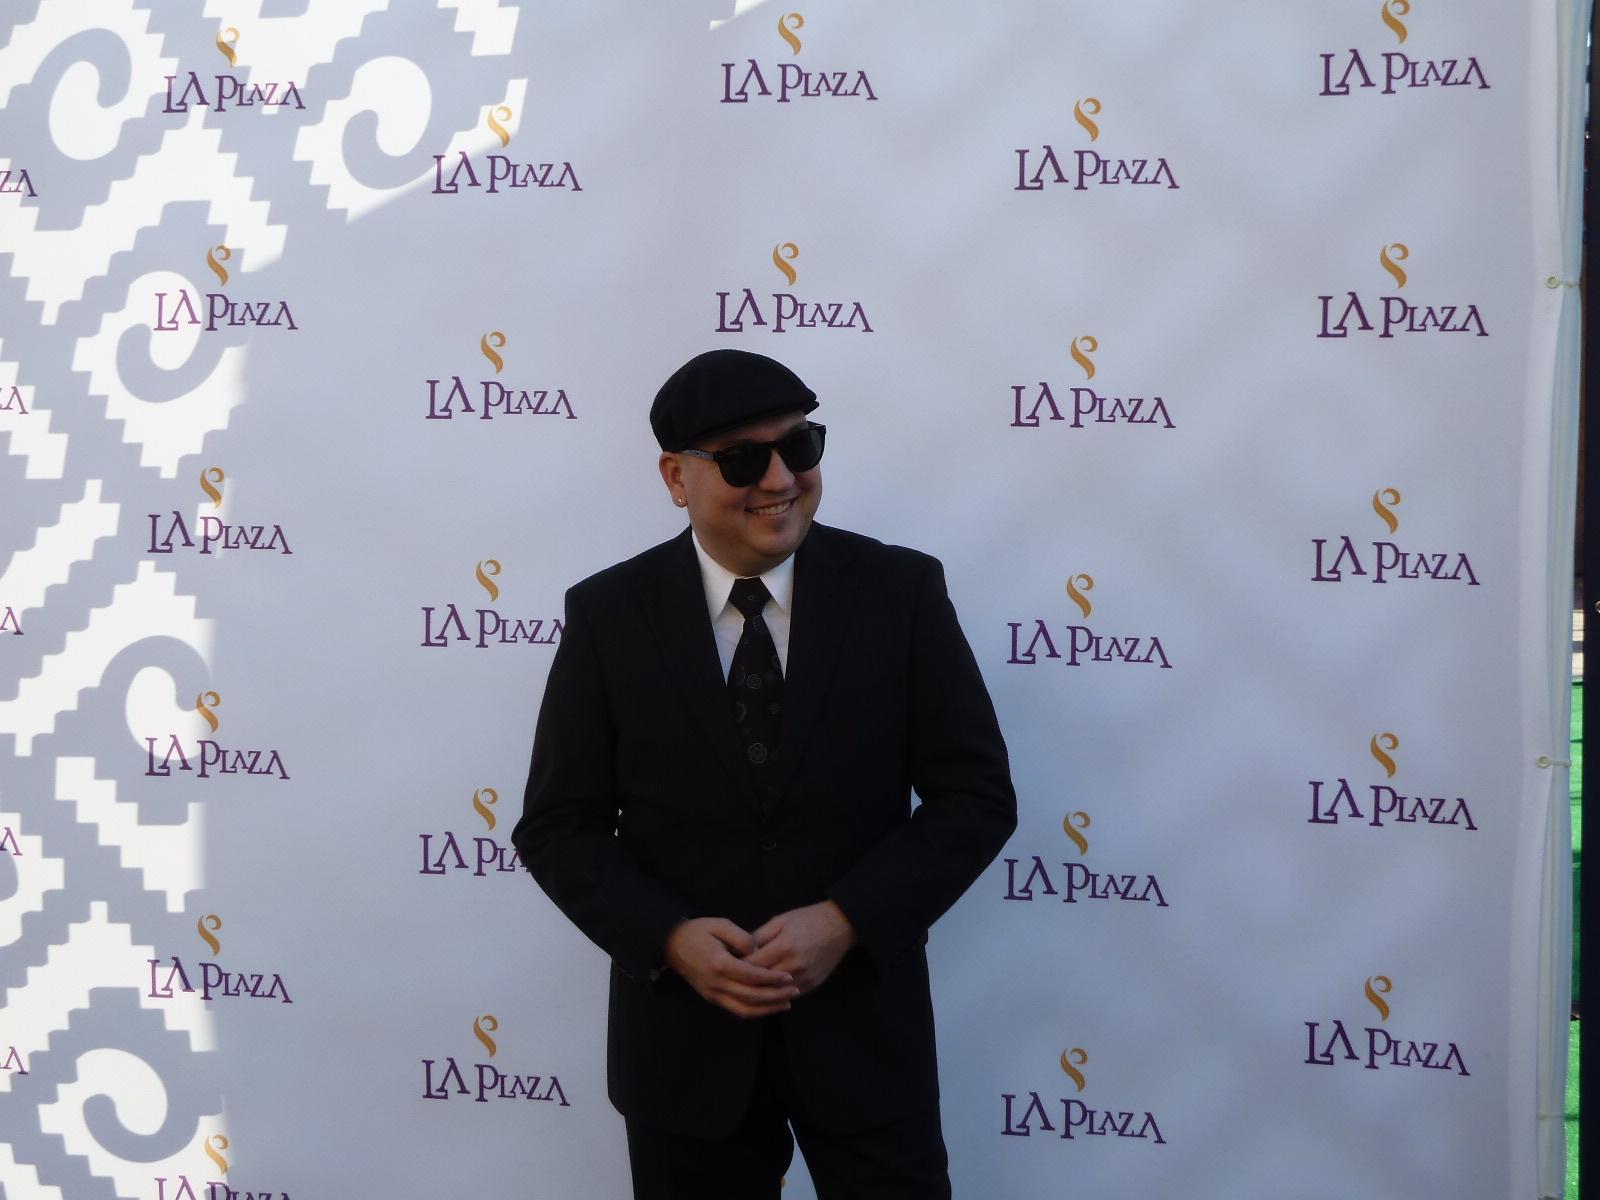 Raul at La Plaza